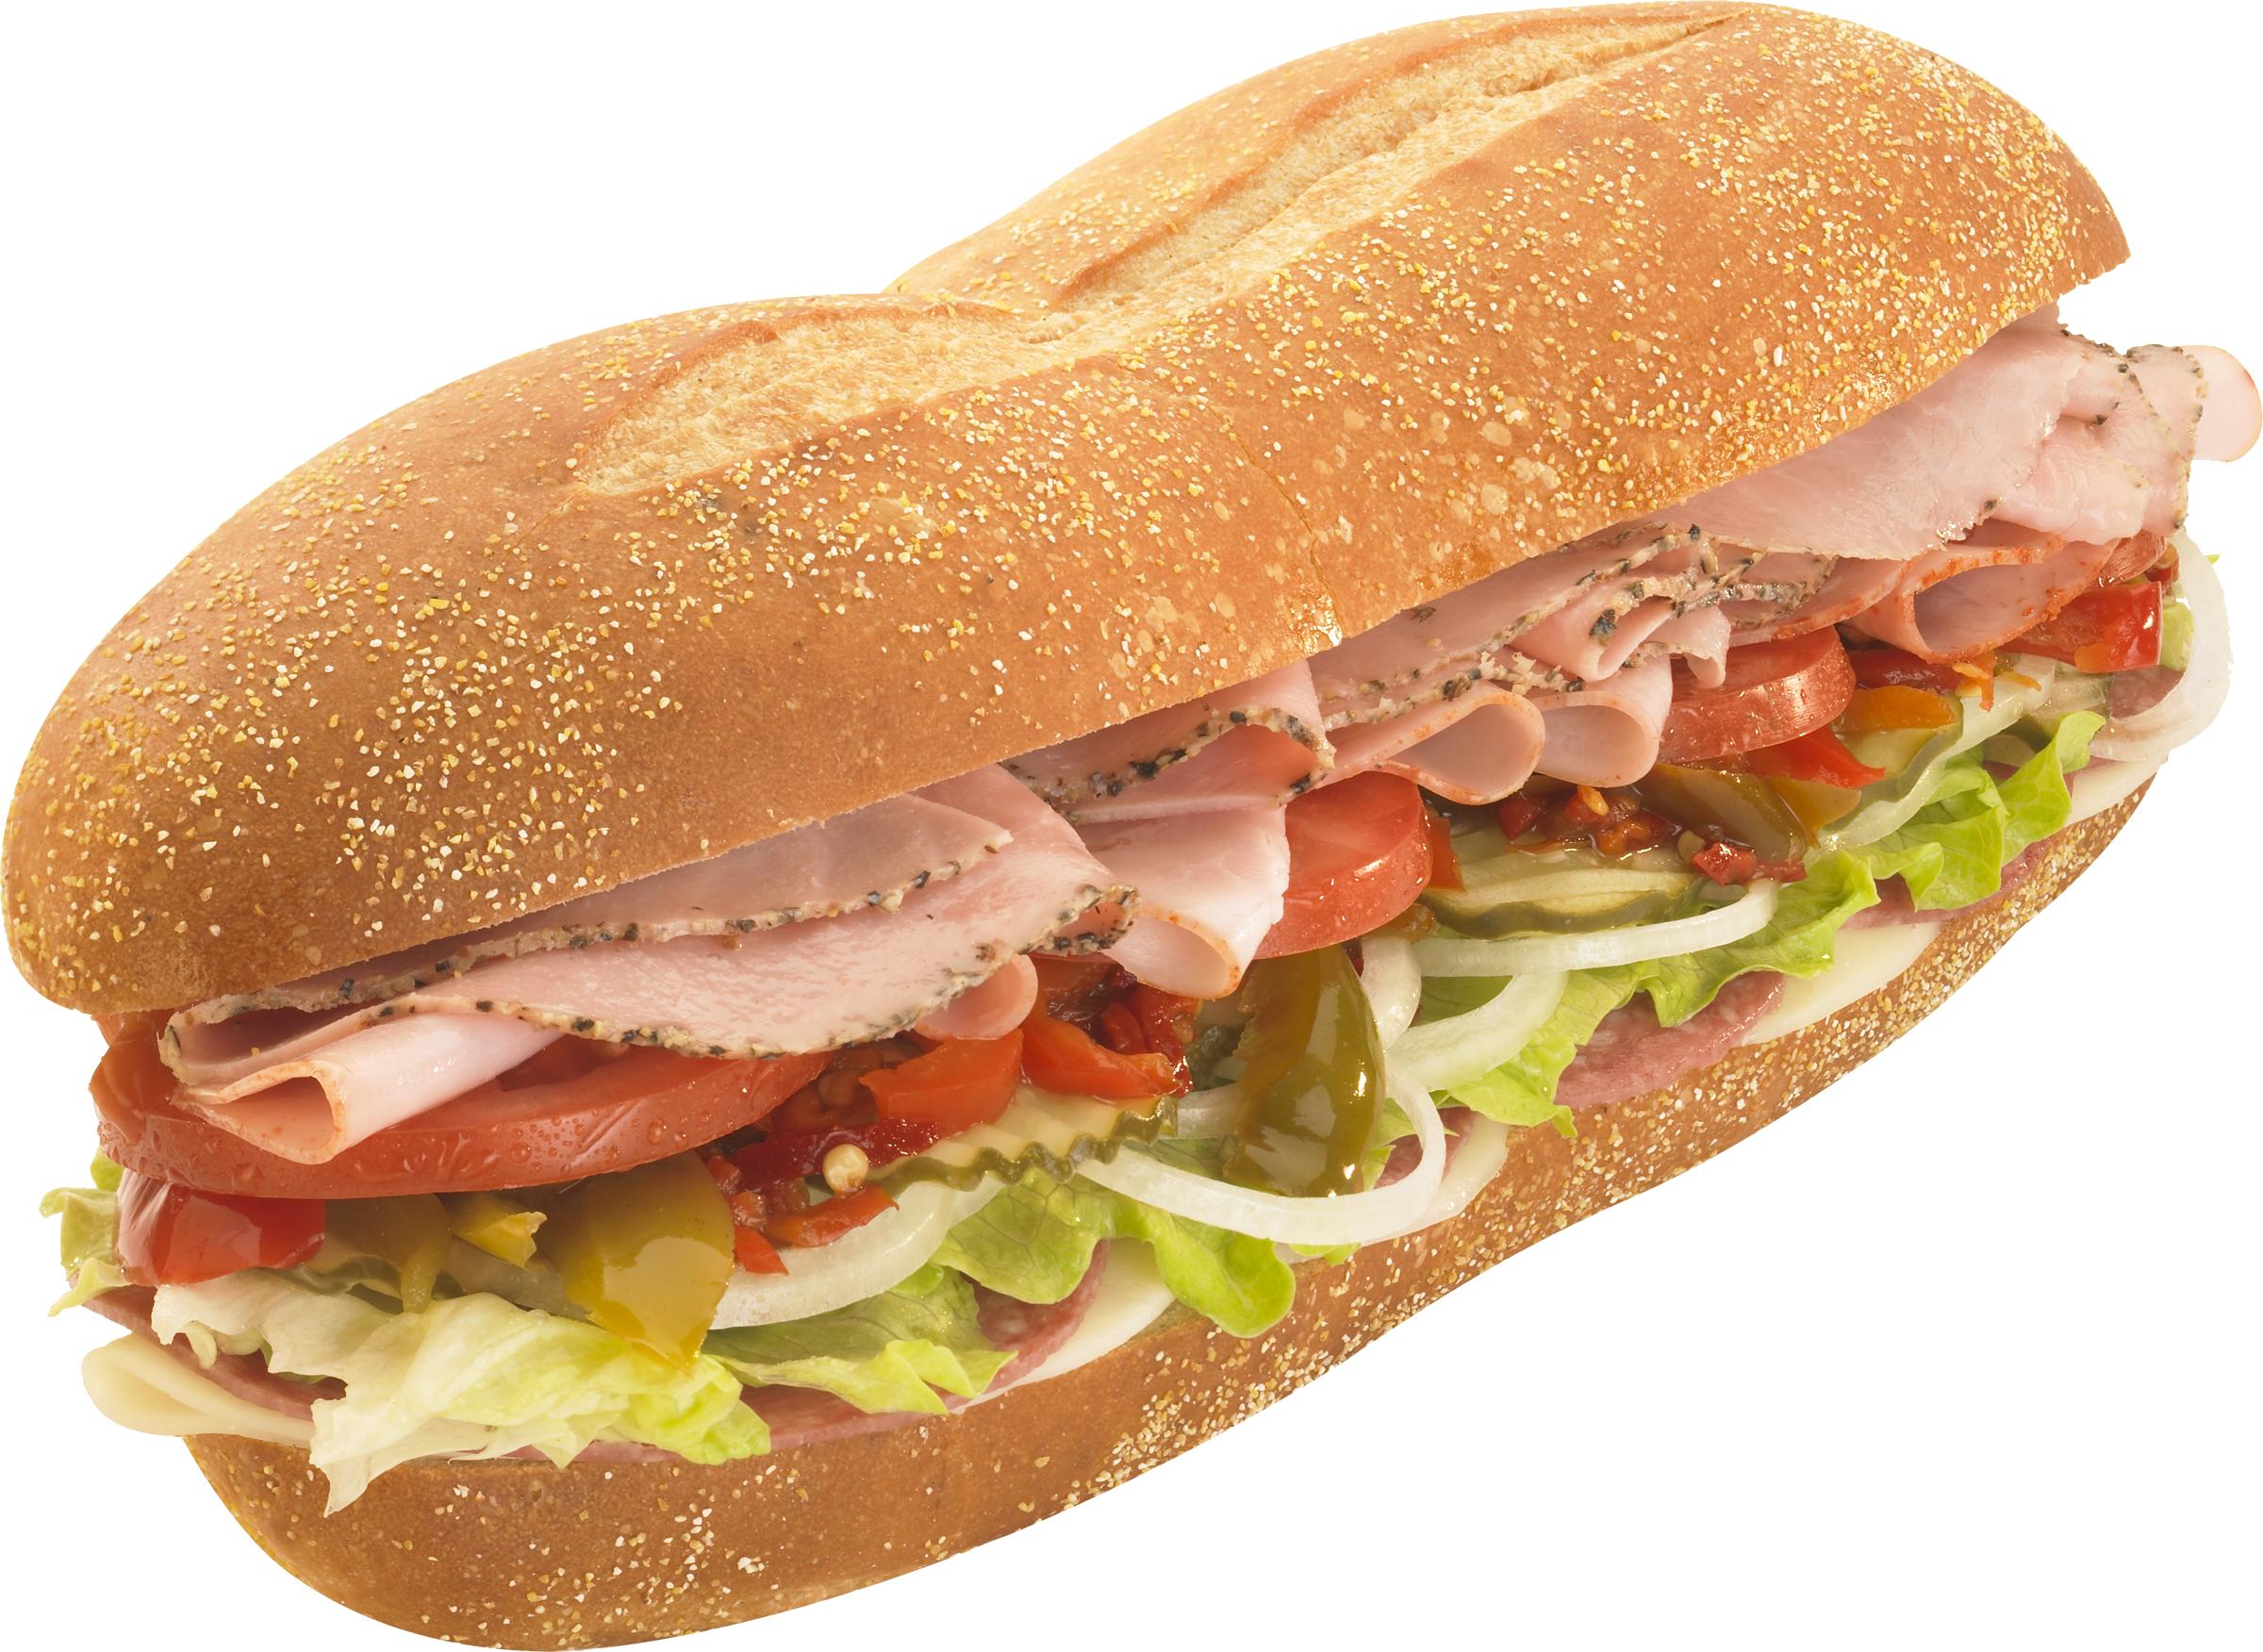 Free Sandwich Png Transparent Images Download Free Clip